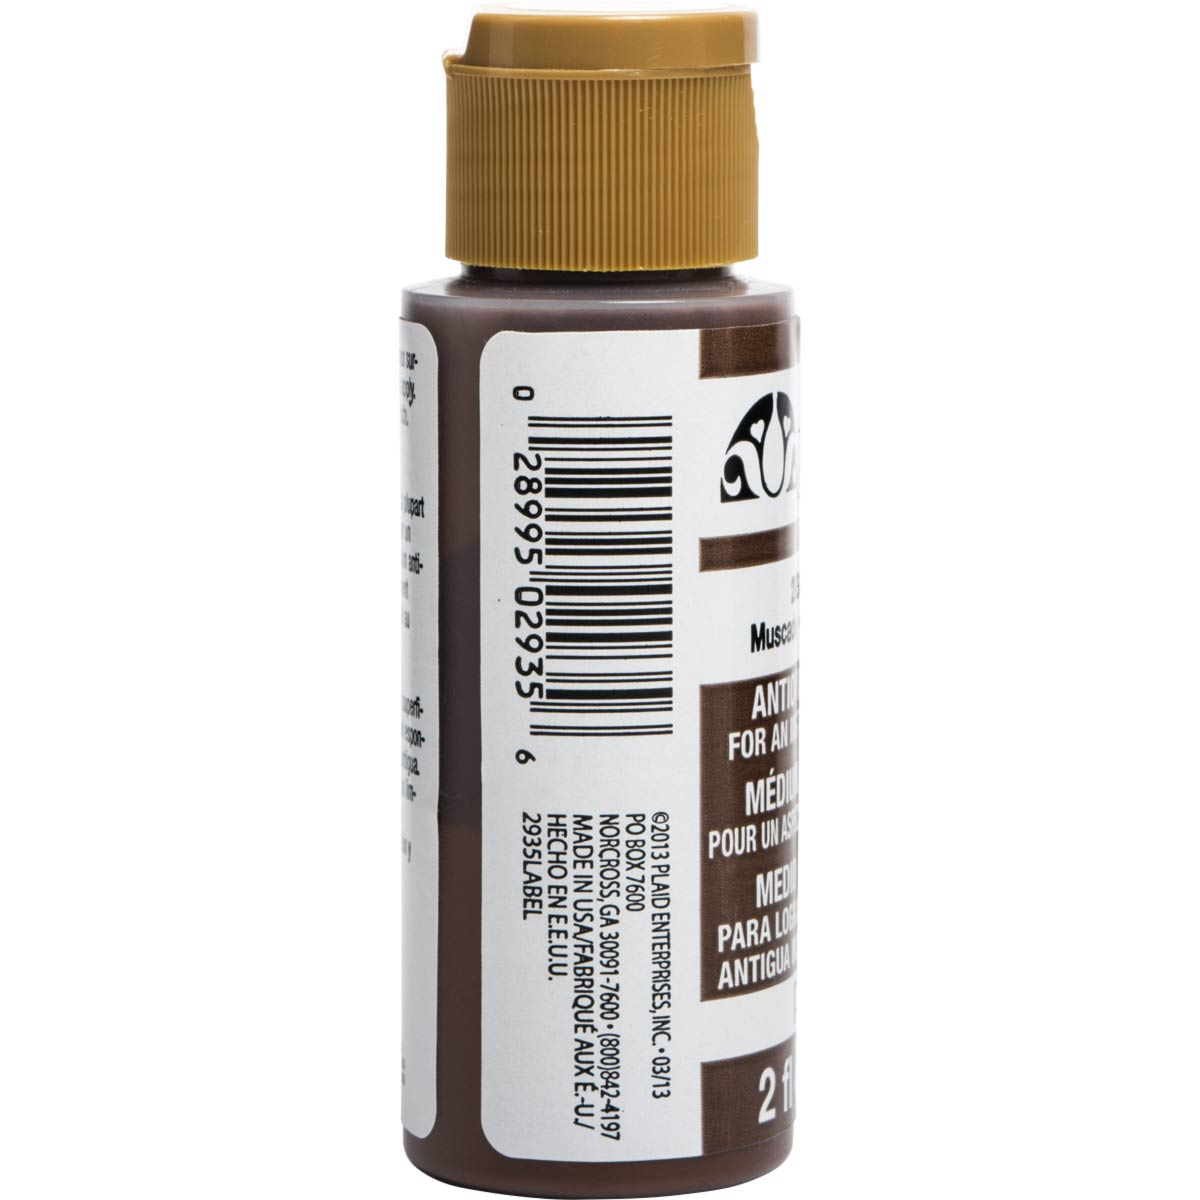 FolkArt ® Mediums - Antiquing Medium - Nutmeg, 2 oz. - 2935